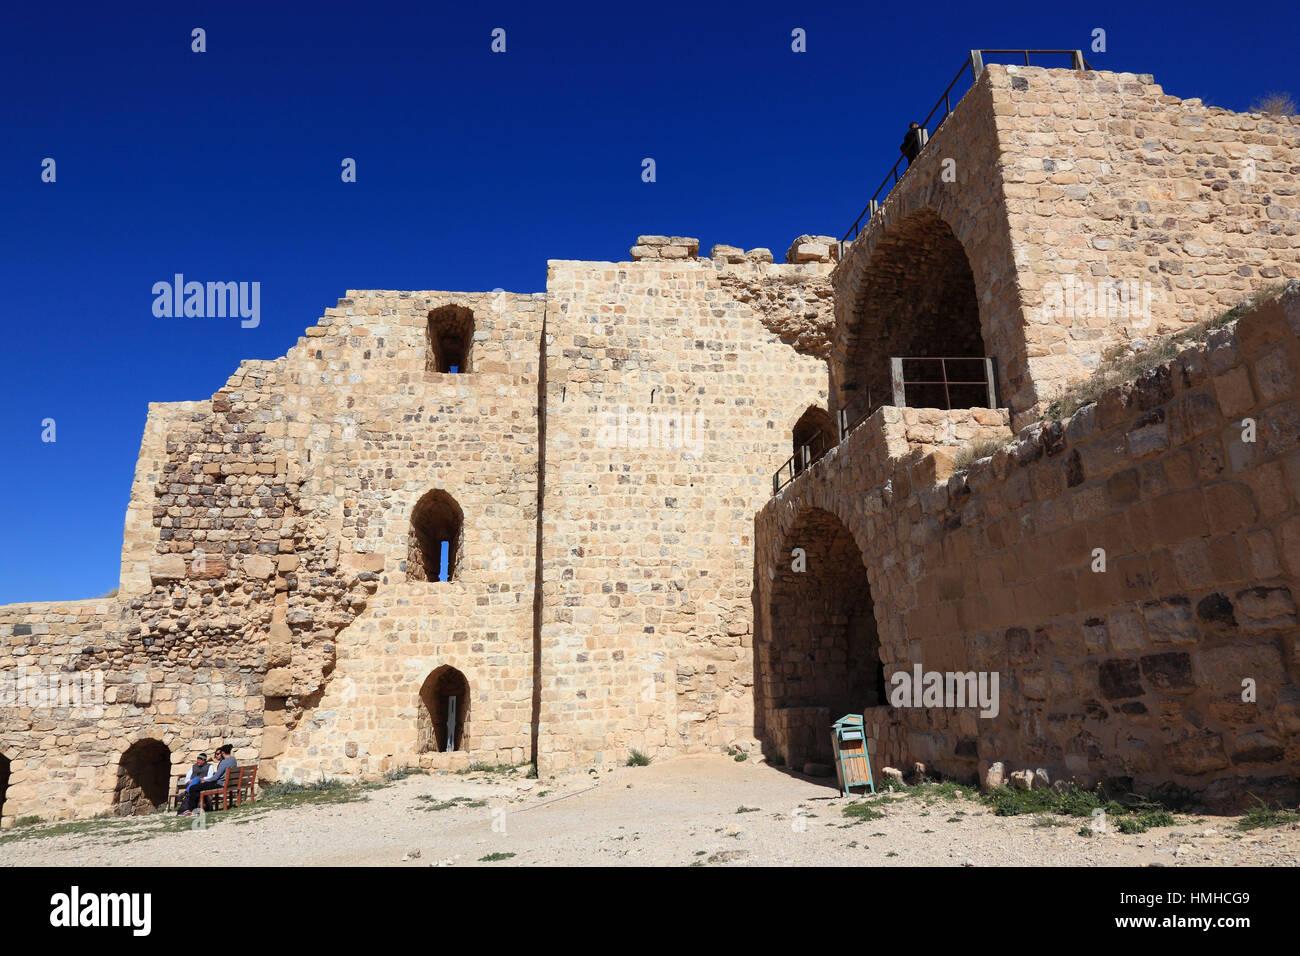 Ruins of the castle of the crusaders of the Kingdom of Jerusalem, Templars castle, Kerak, Jordan Stock Photo